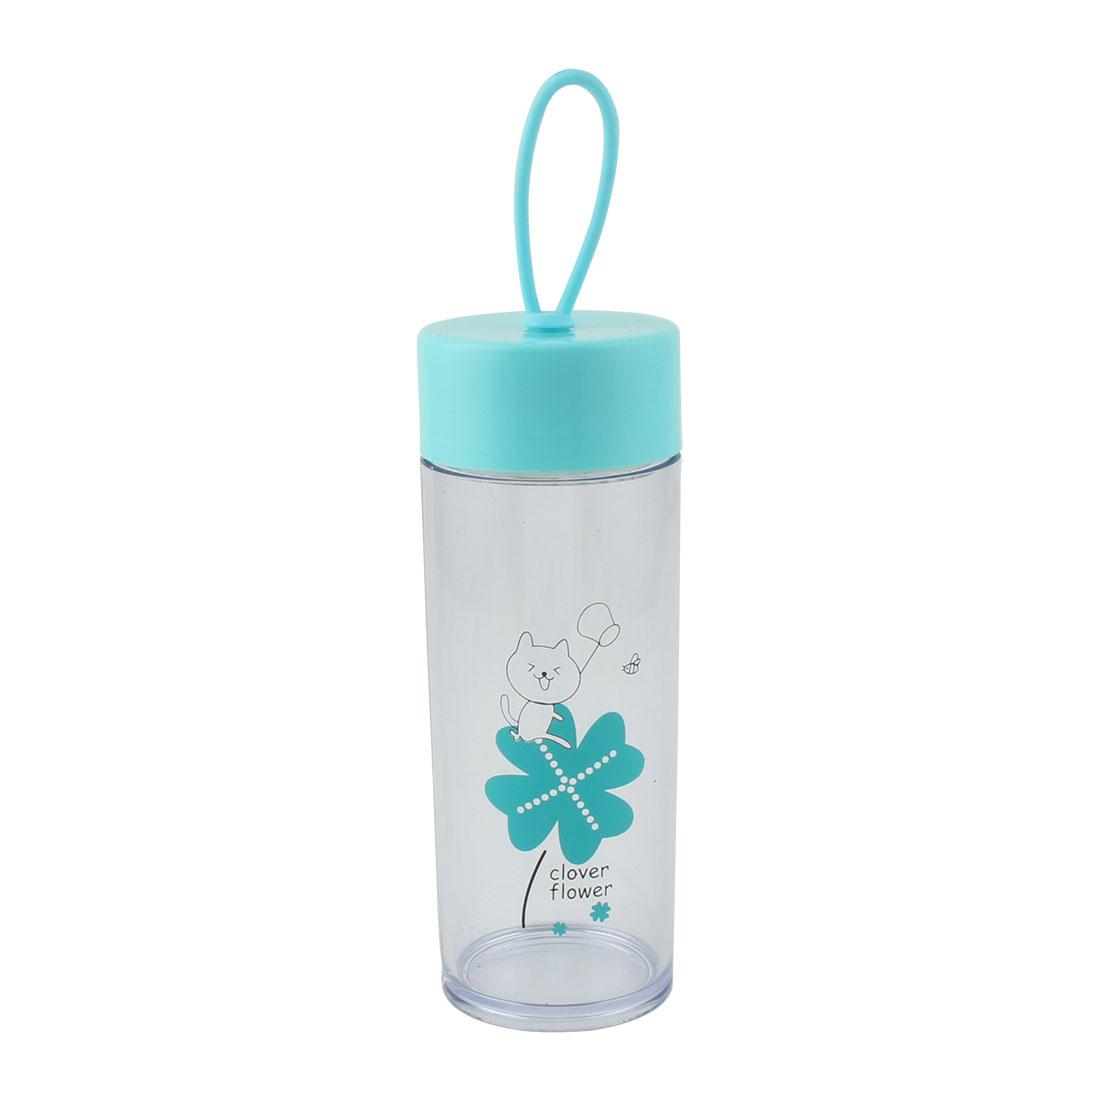 Outdoor Plastic Flower Pattern Sports Travelling Drinking Water Bottle Cup Mug Sky Blue 410ml